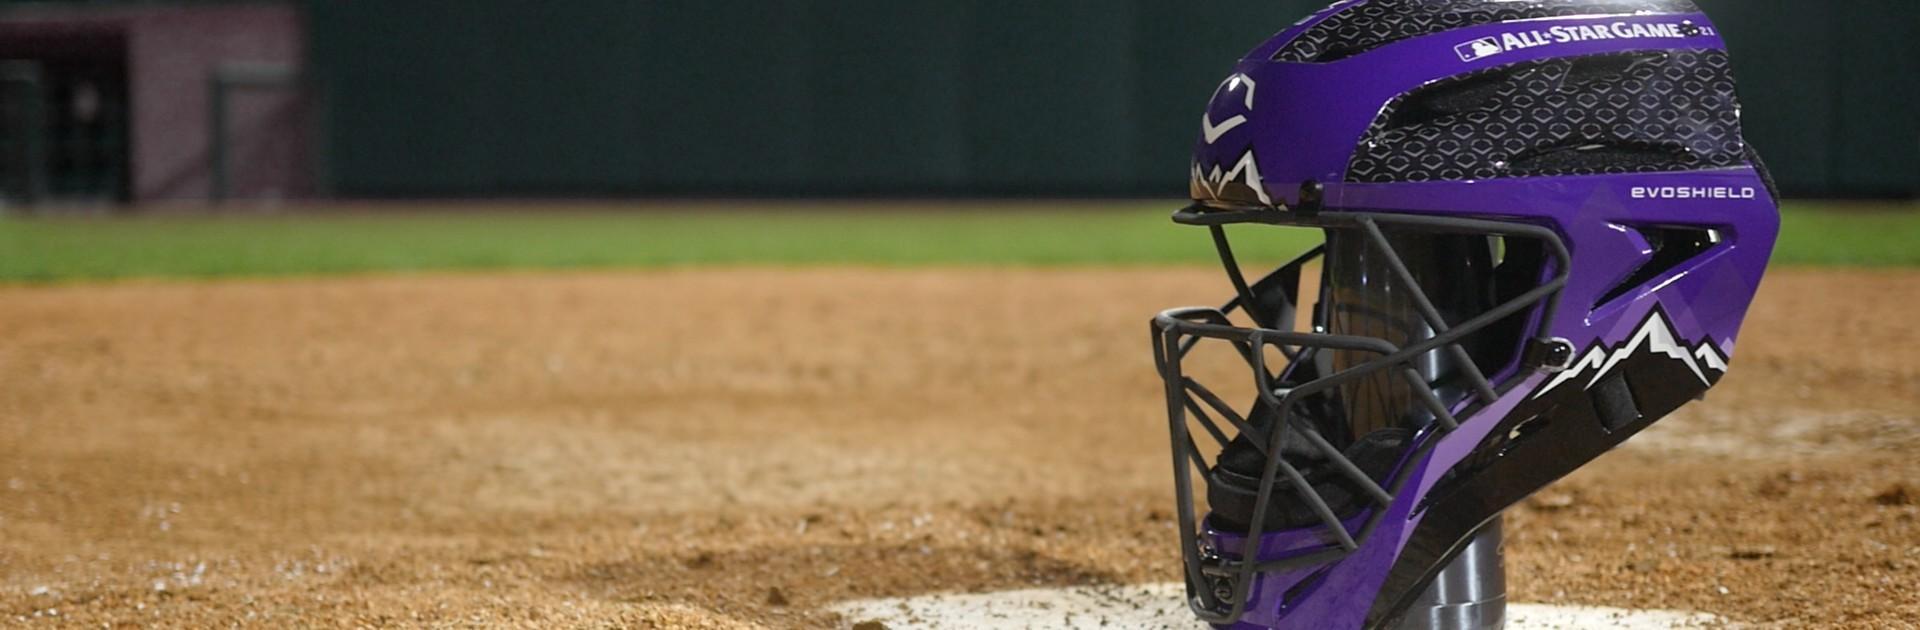 Evoshield-Home-Run-Derby-Catchers-Helmet-Pro-SRZ-Major-League-Baseball